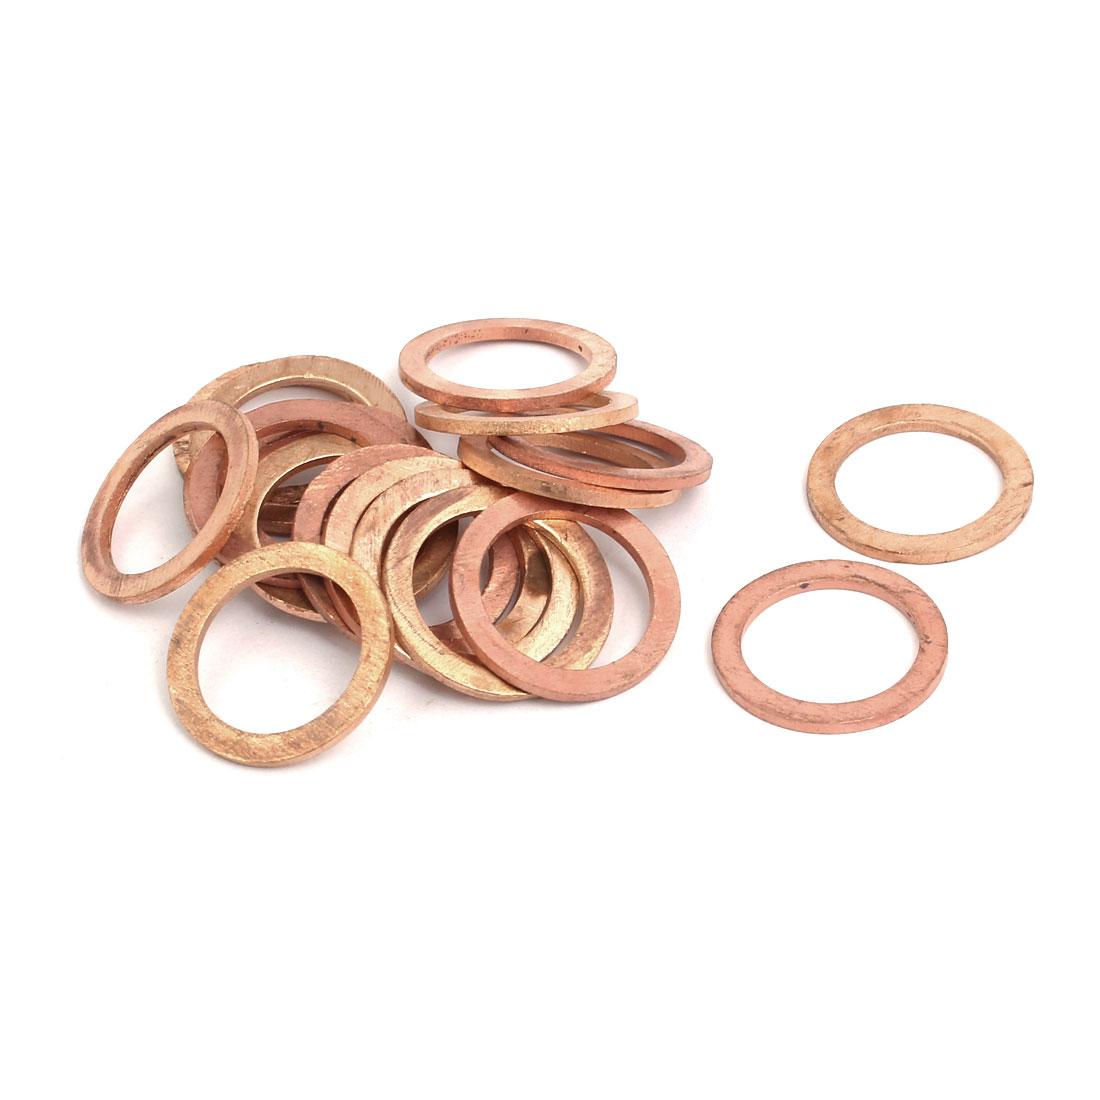 20pcs 17mmx23mmx1.5mm Copper Flat Ring Sealing Crush Washer Gasket